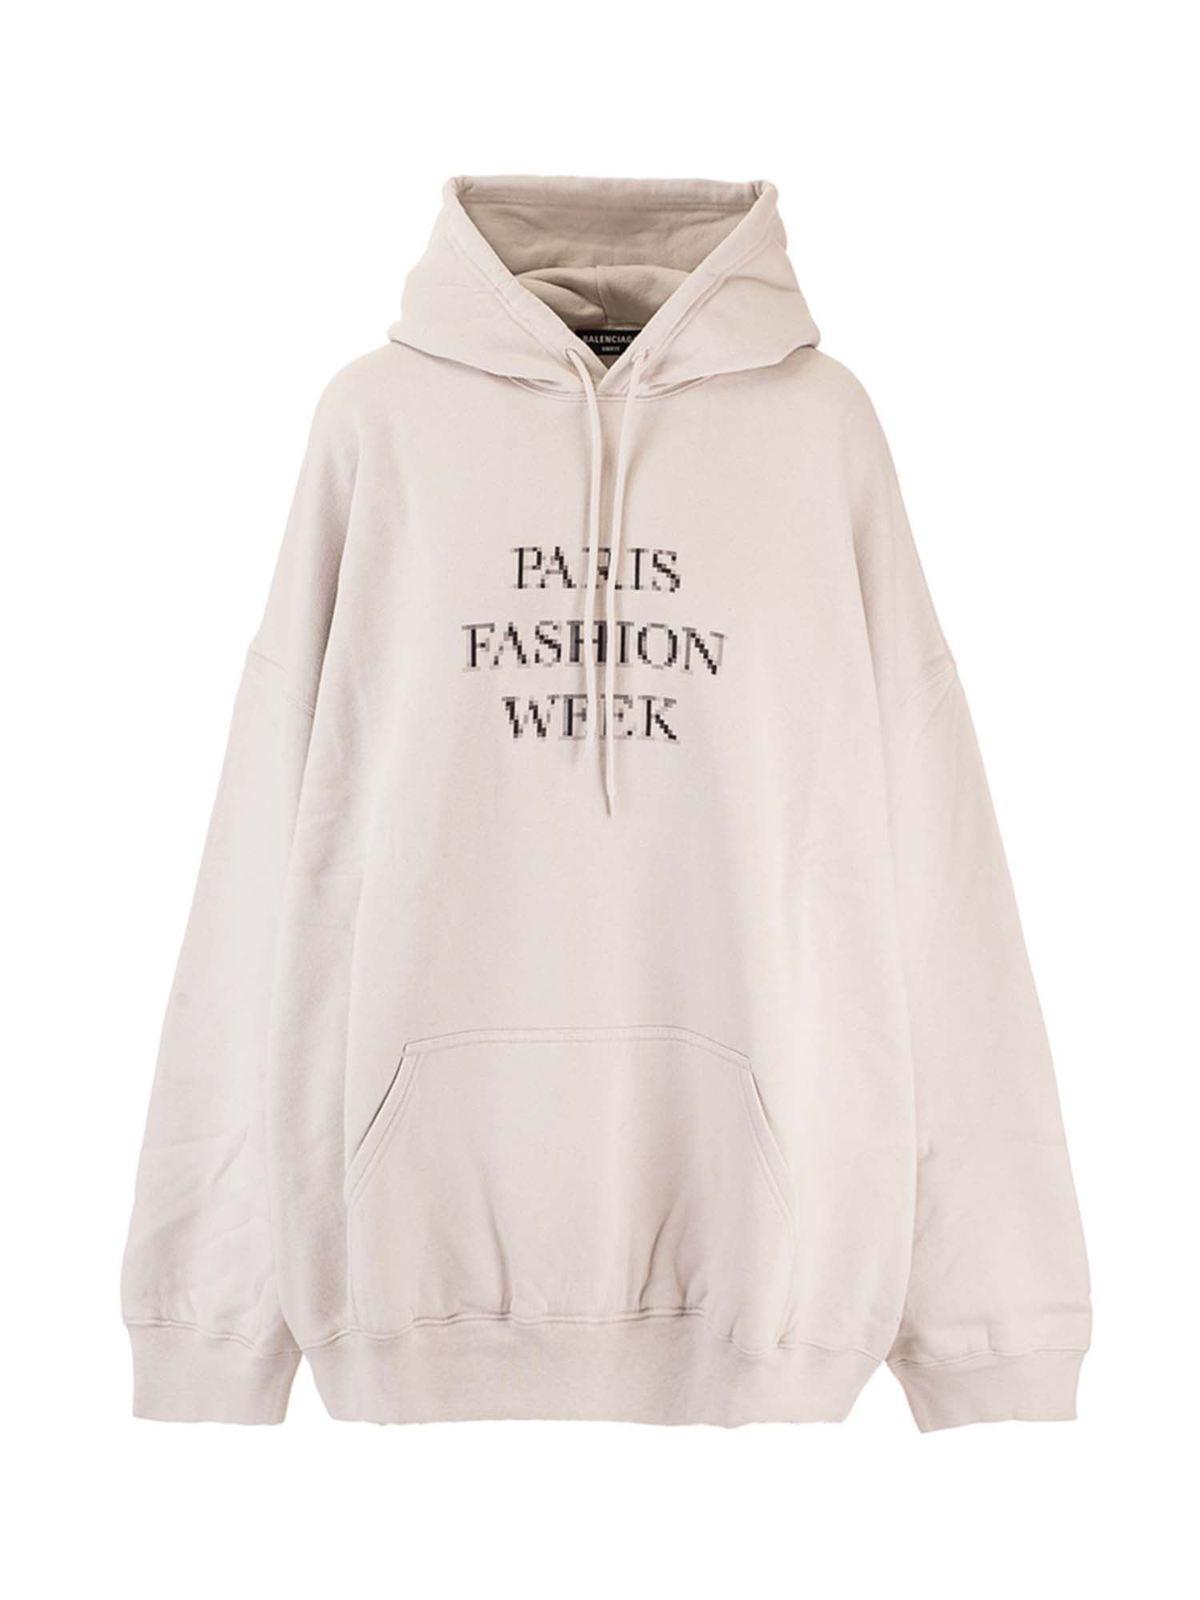 Balenciaga Clothing PARIS FASHION WEEK HOODIE IN GREY